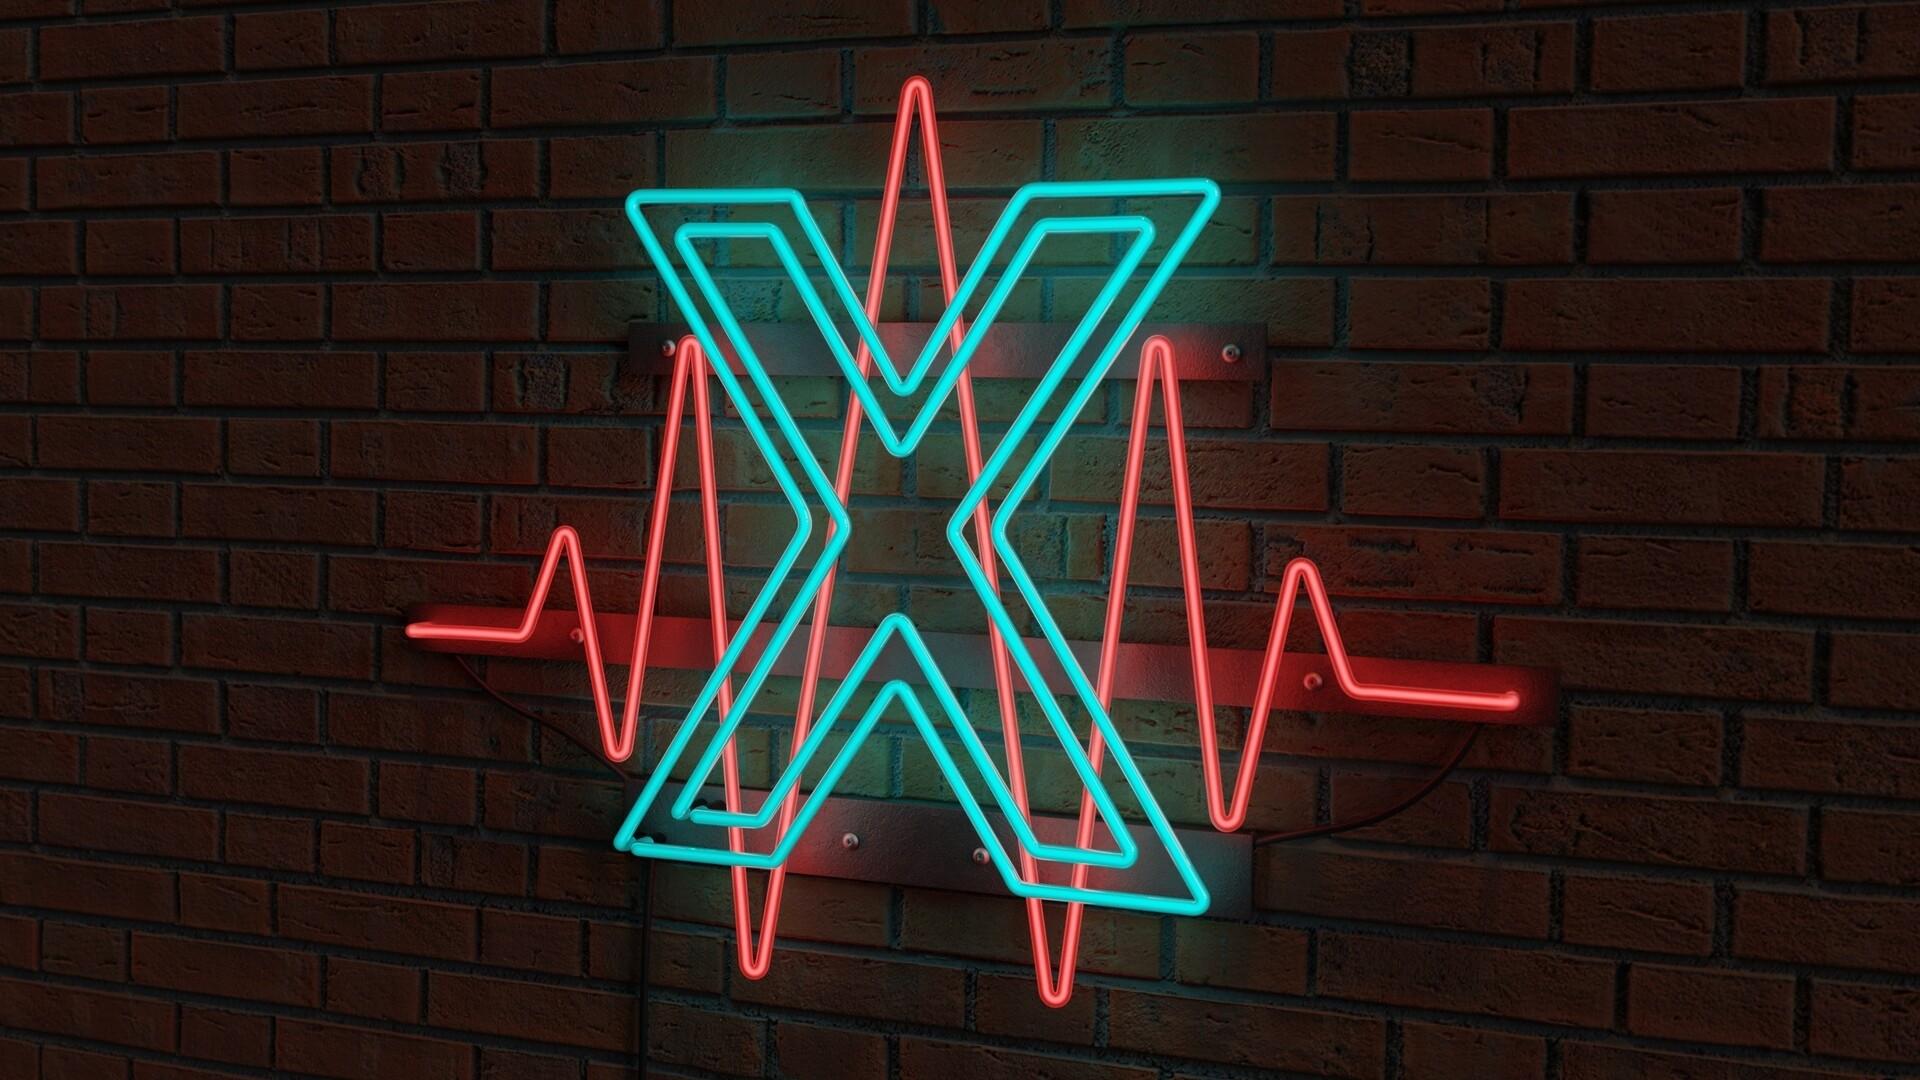 Neon Sign wallpaper photo hd